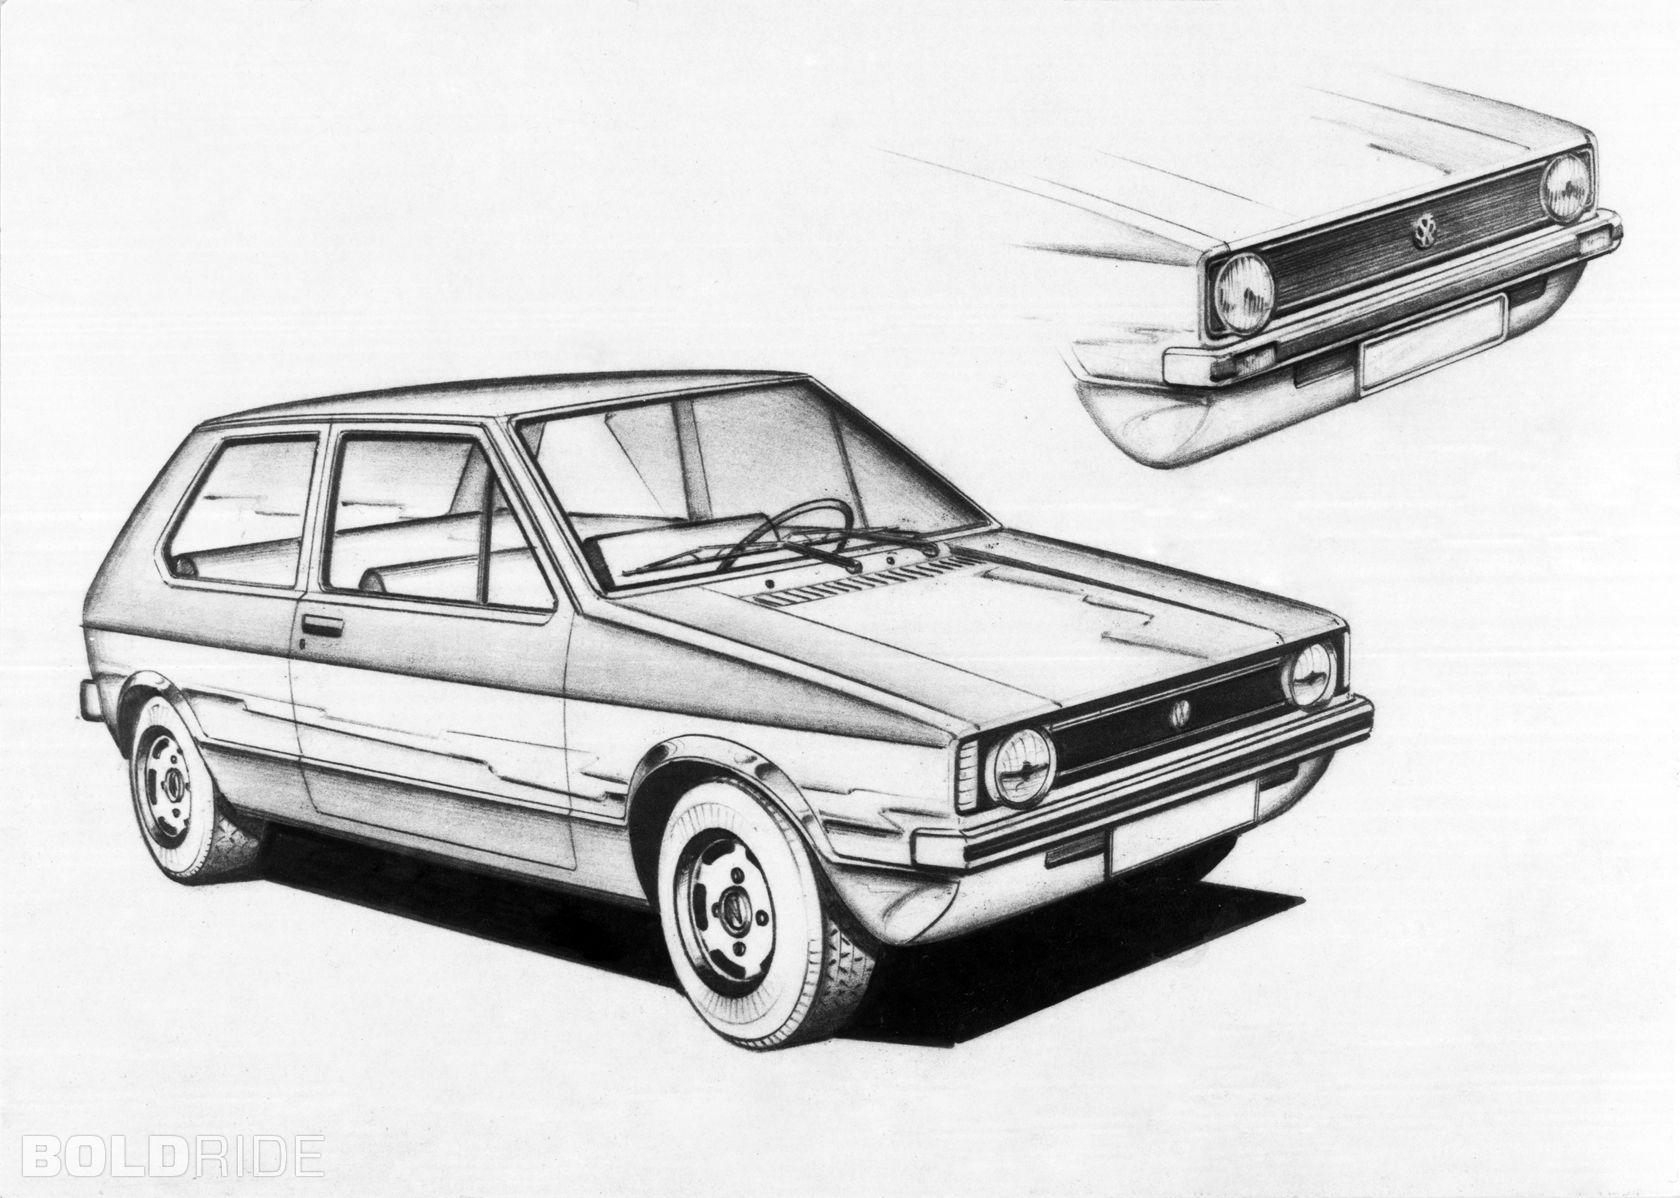 Volkswagen Golf Mk1 1980 Bddbfefbea